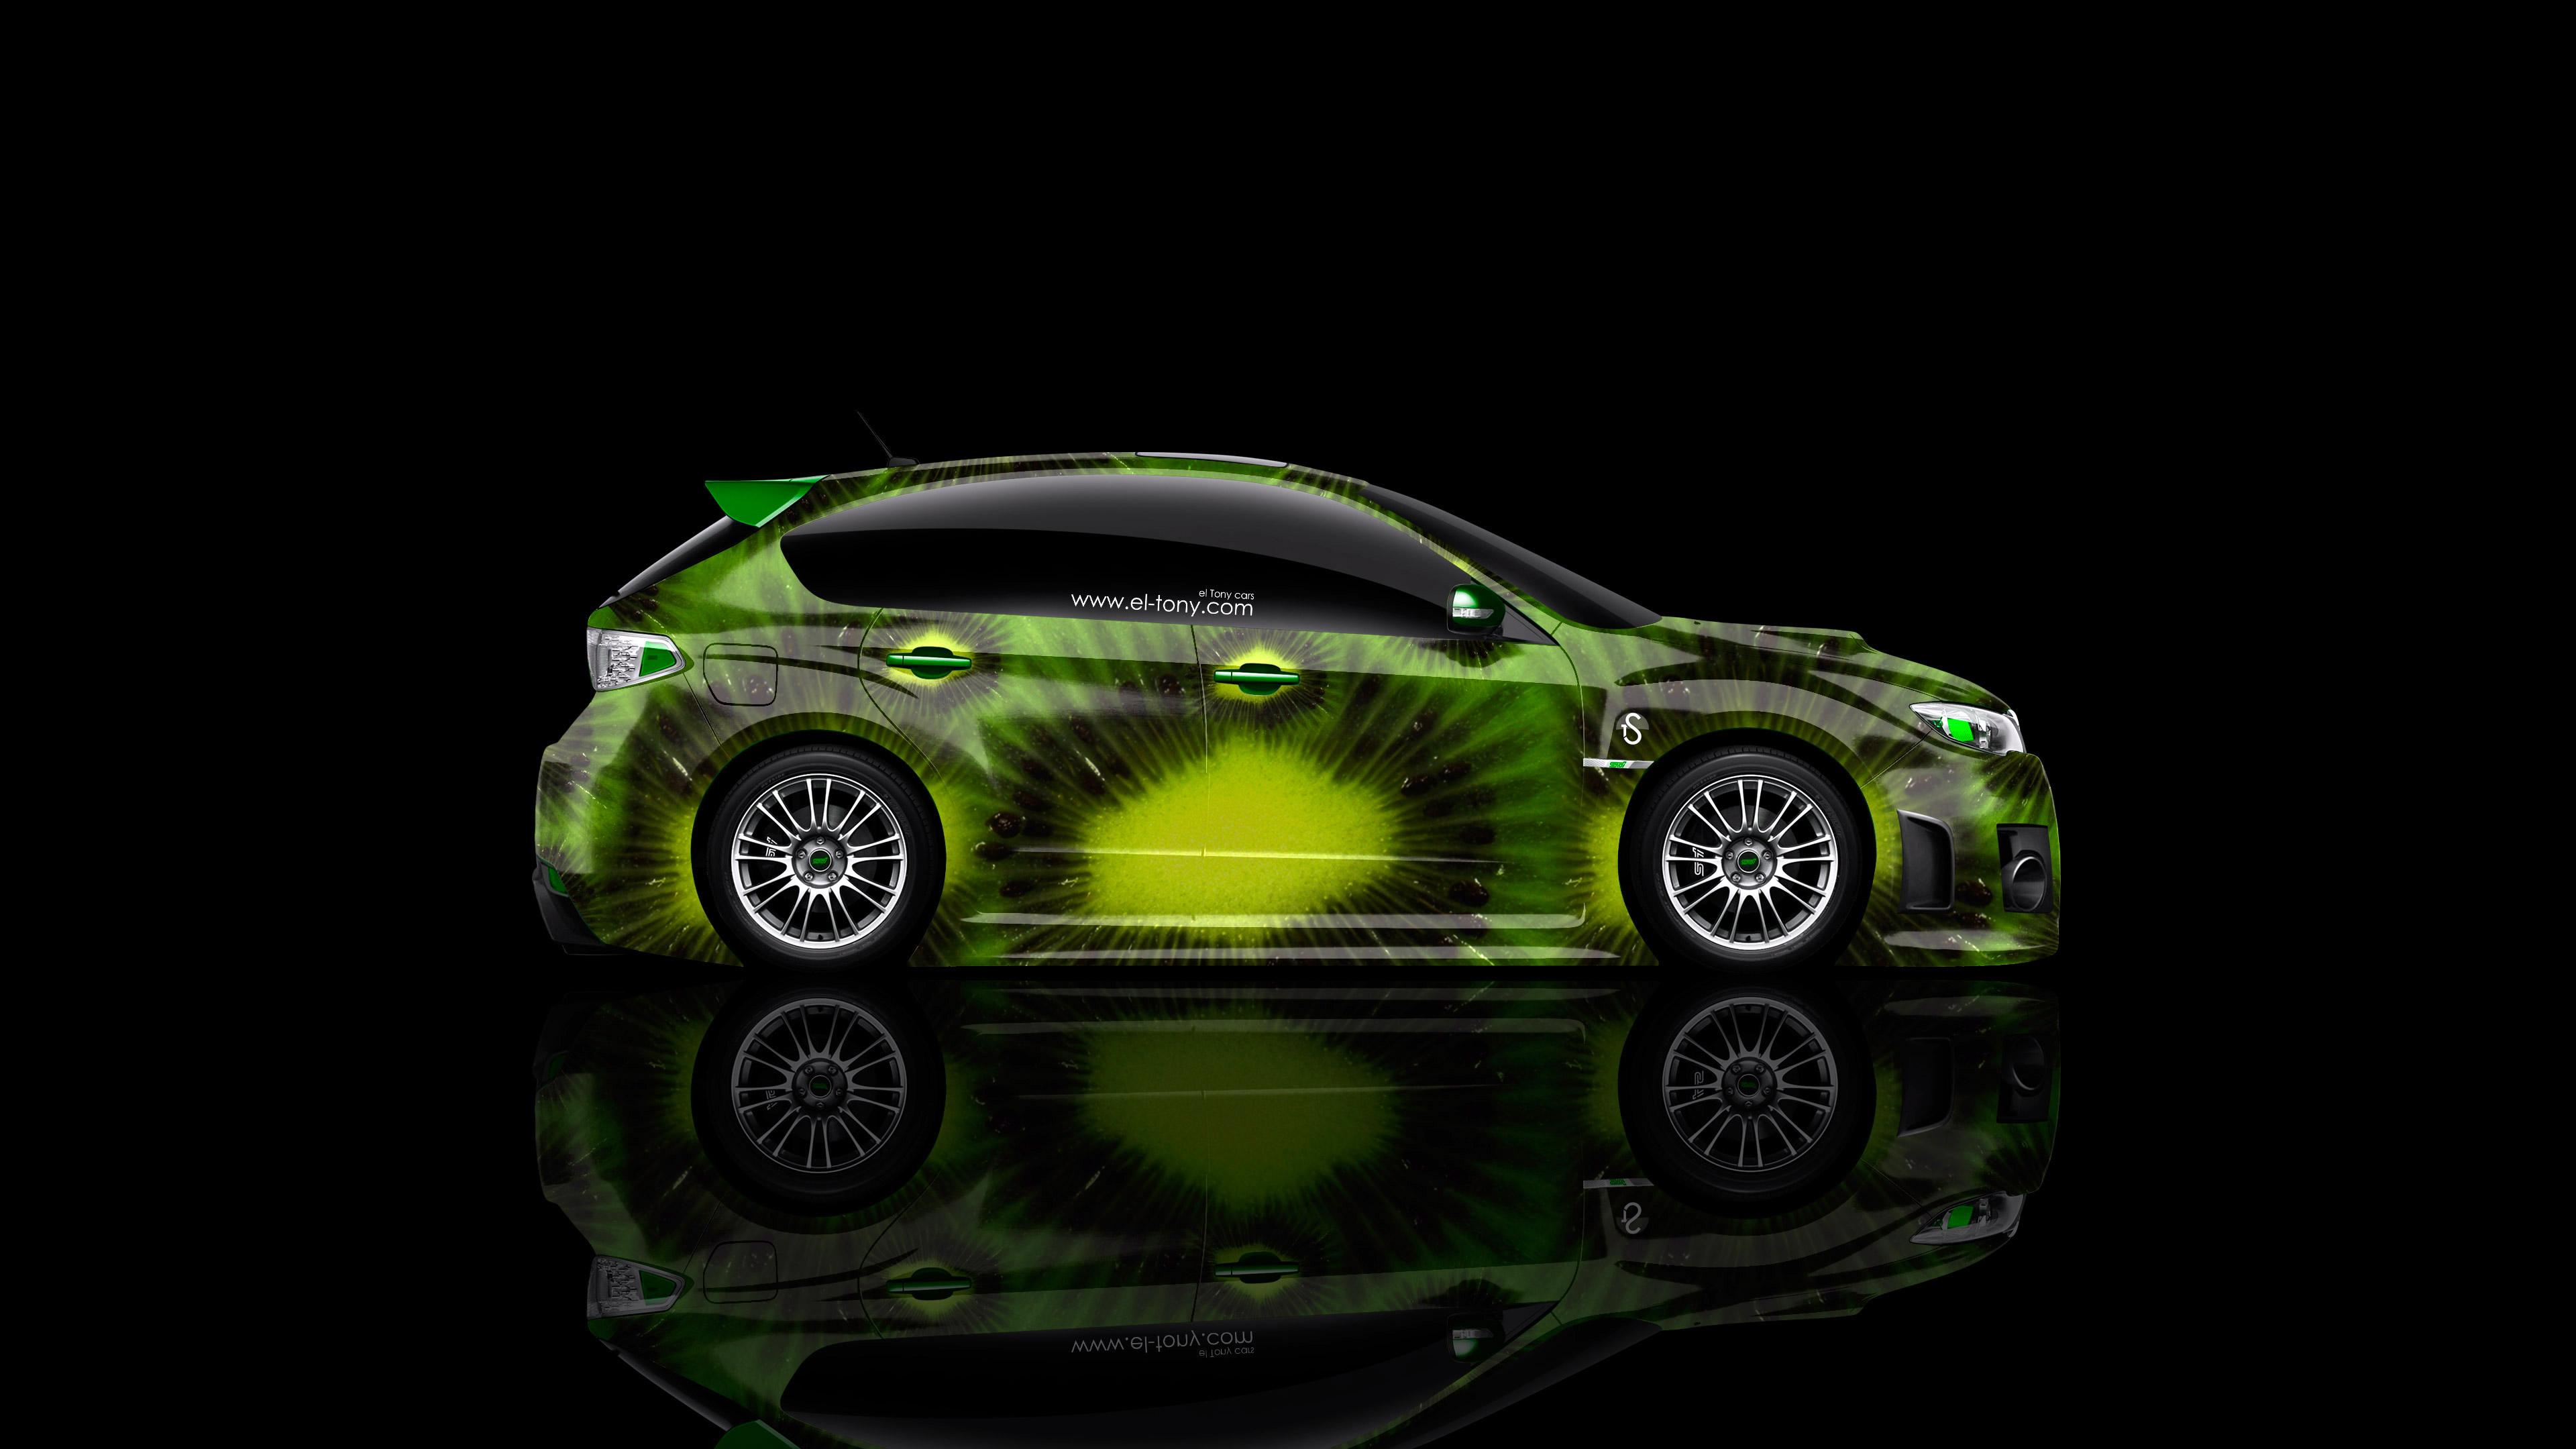 Captivating Subaru Impreza WRX STI JDM Side Kiwi Aerography Car 2014 Green ...